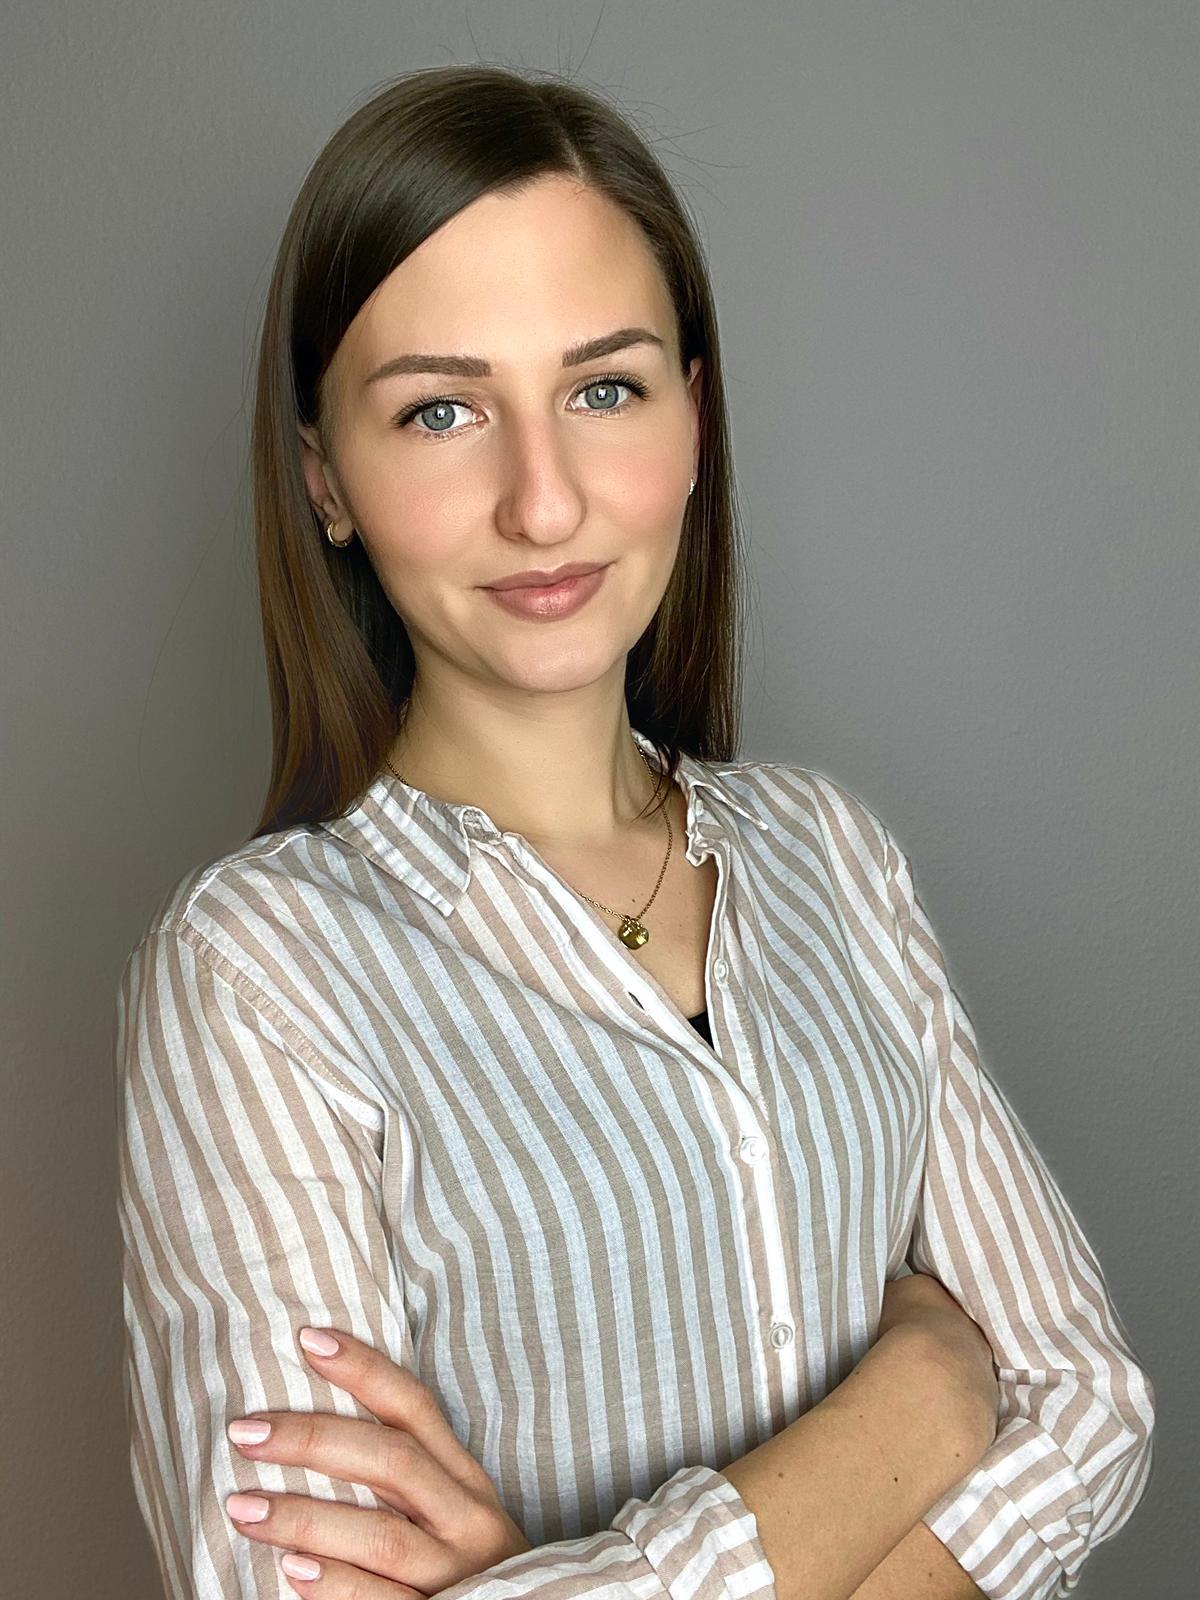 Natalie Purgal